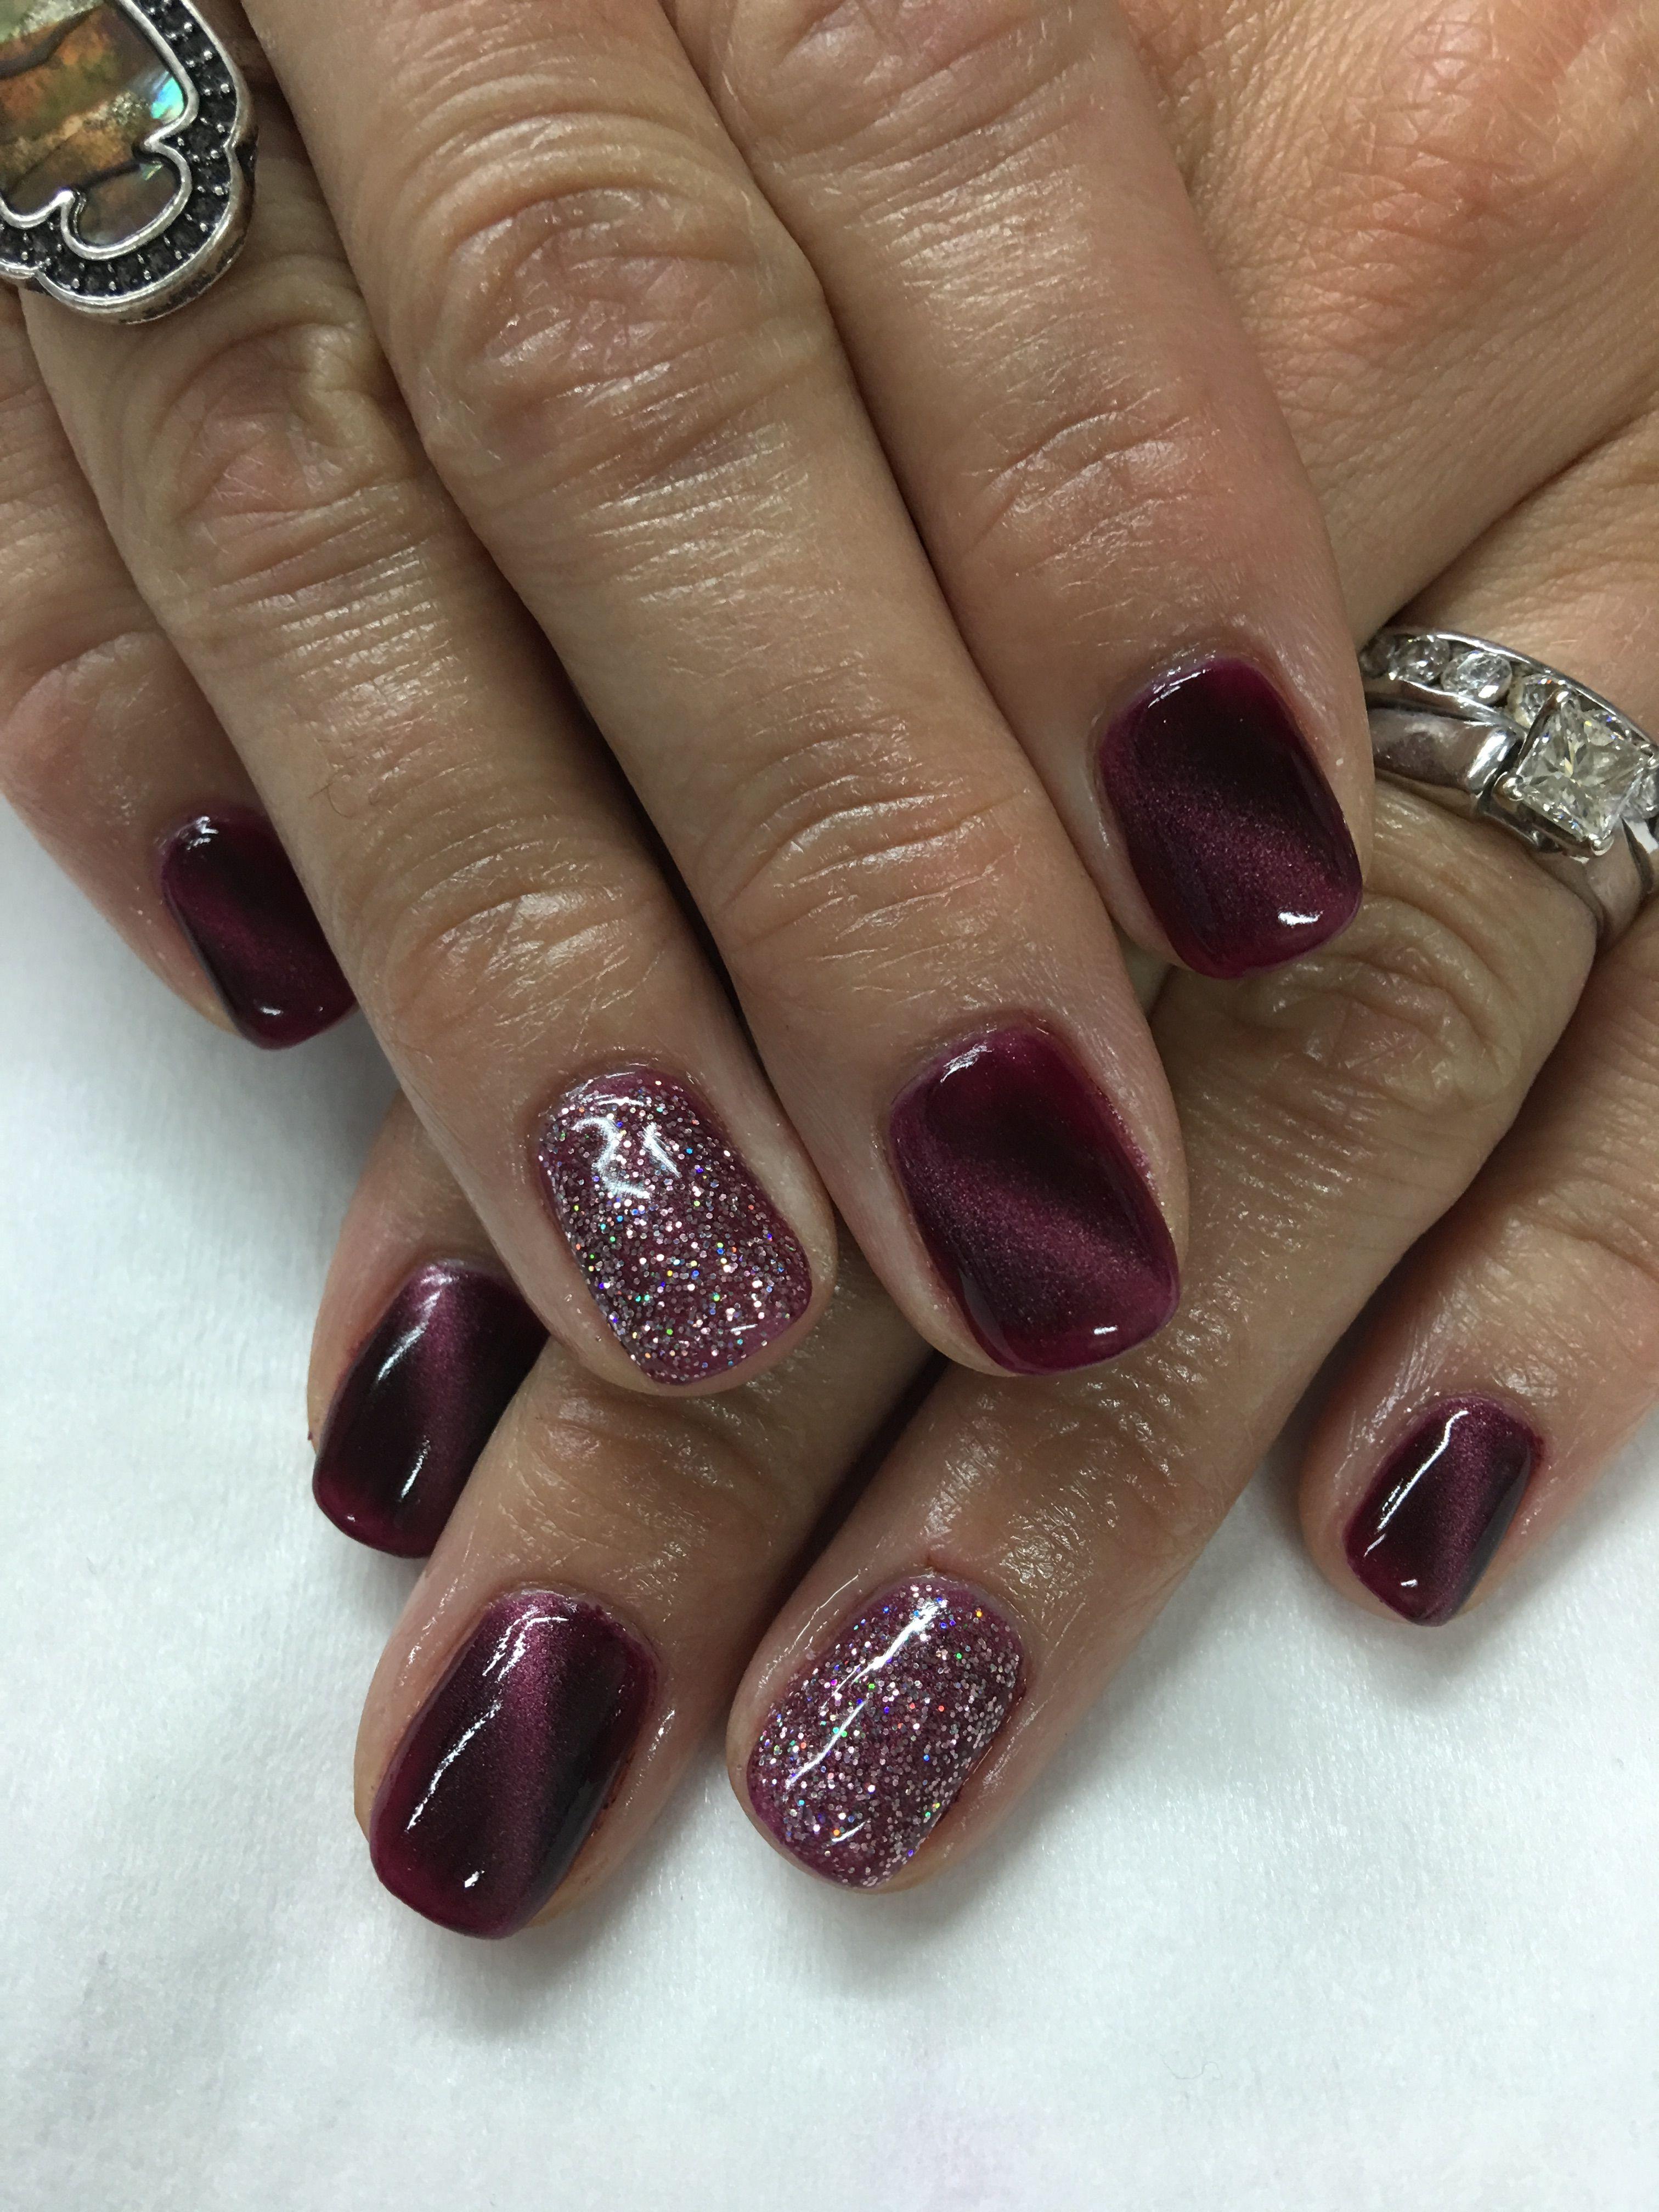 Burgundy Black Cherry Magnetic Gel Polish Pink Glitter Gel Nails Glitter Gel Nails Gel Nails Gel Nail Colors